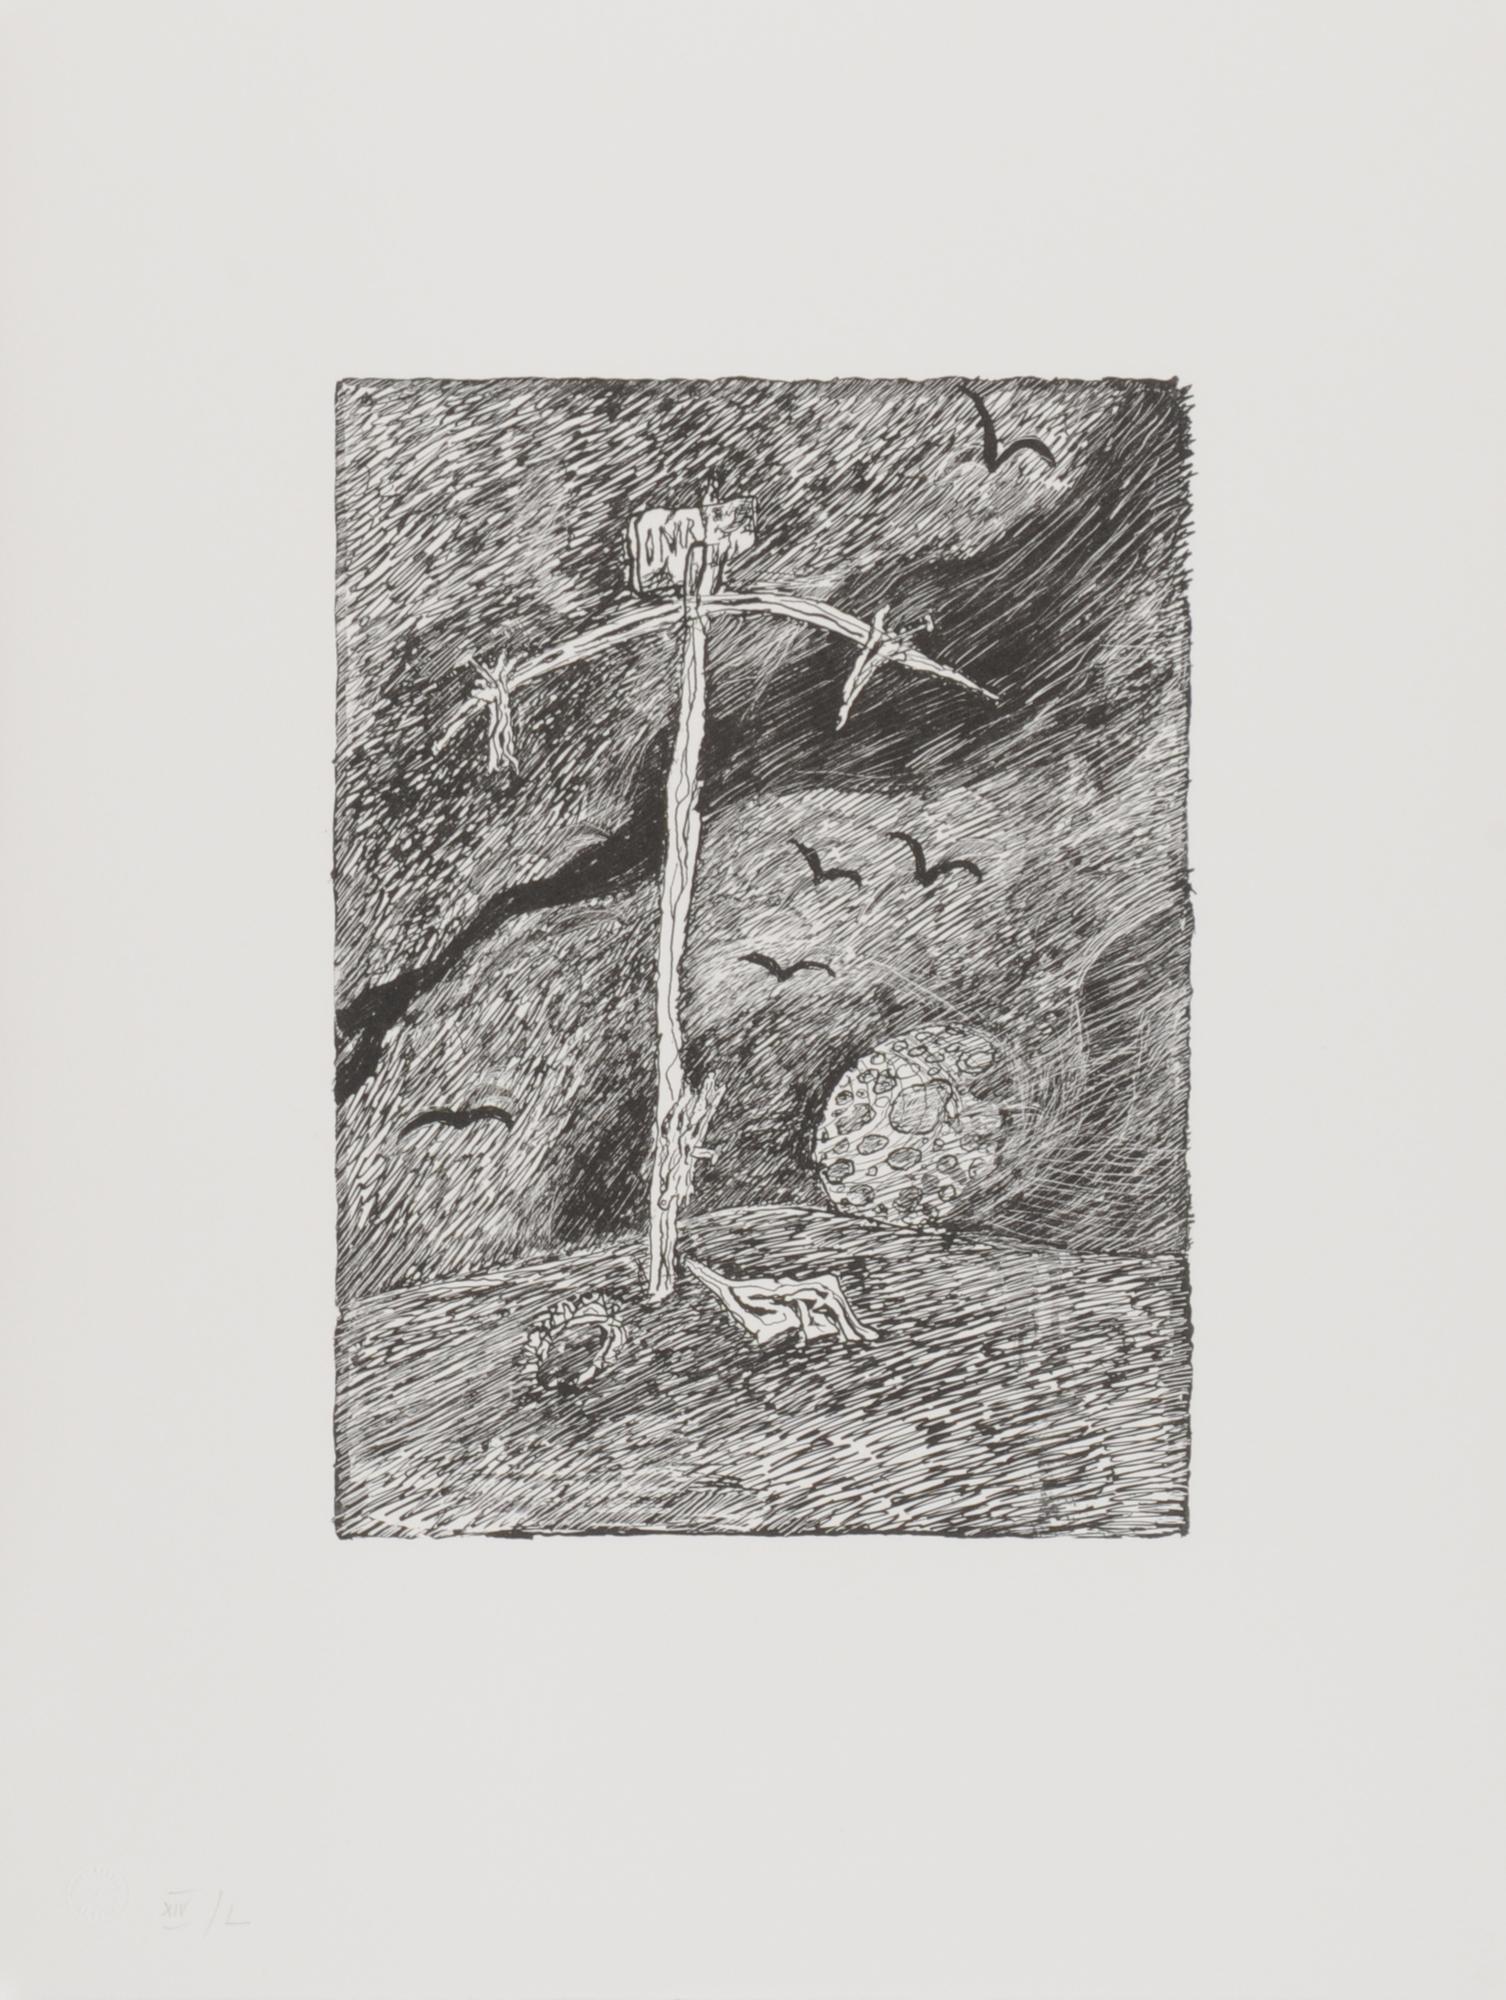 Dürrenmatt Friedrich, Folder. Selbstgespräch